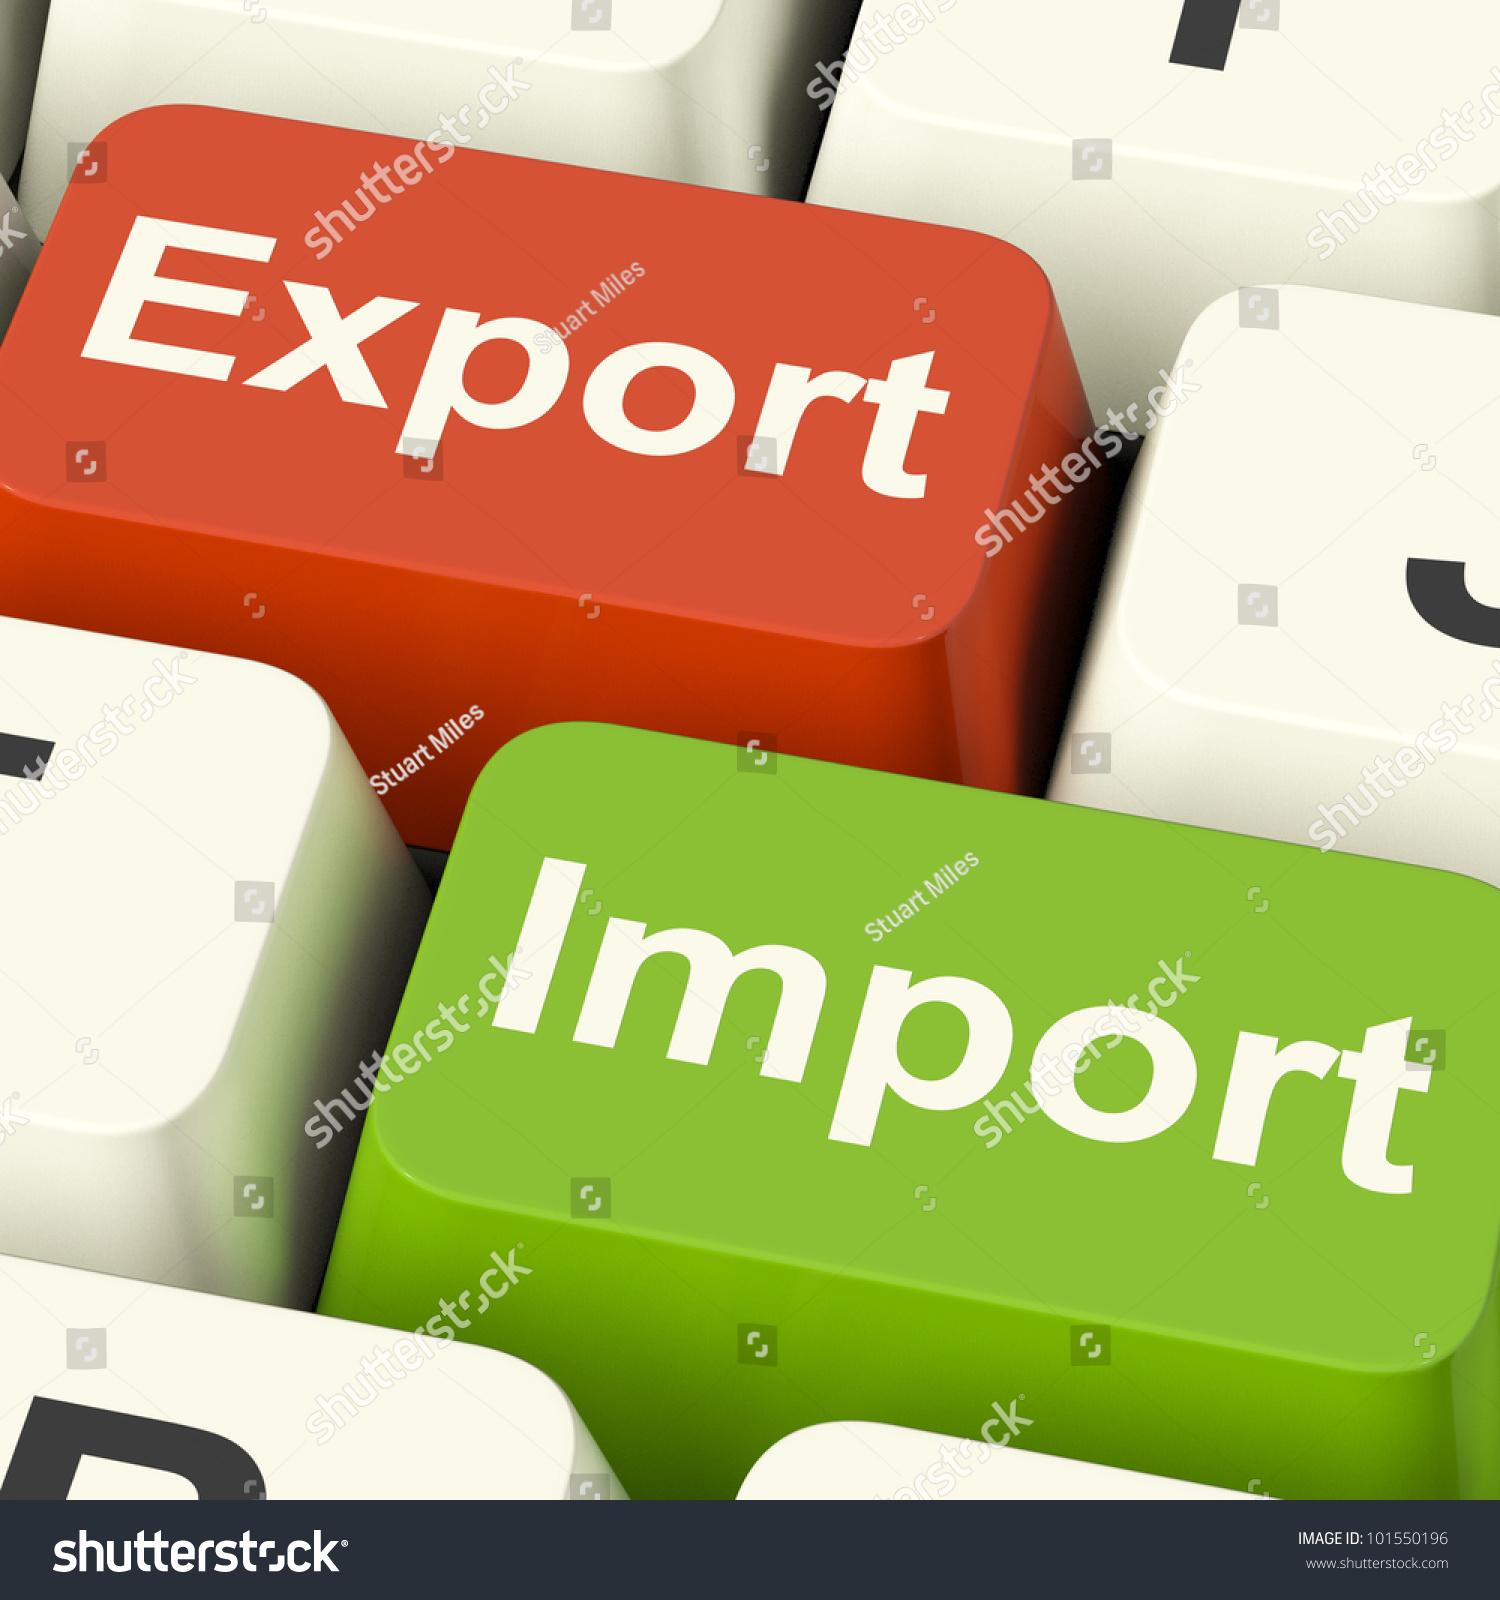 Trade Toolkit